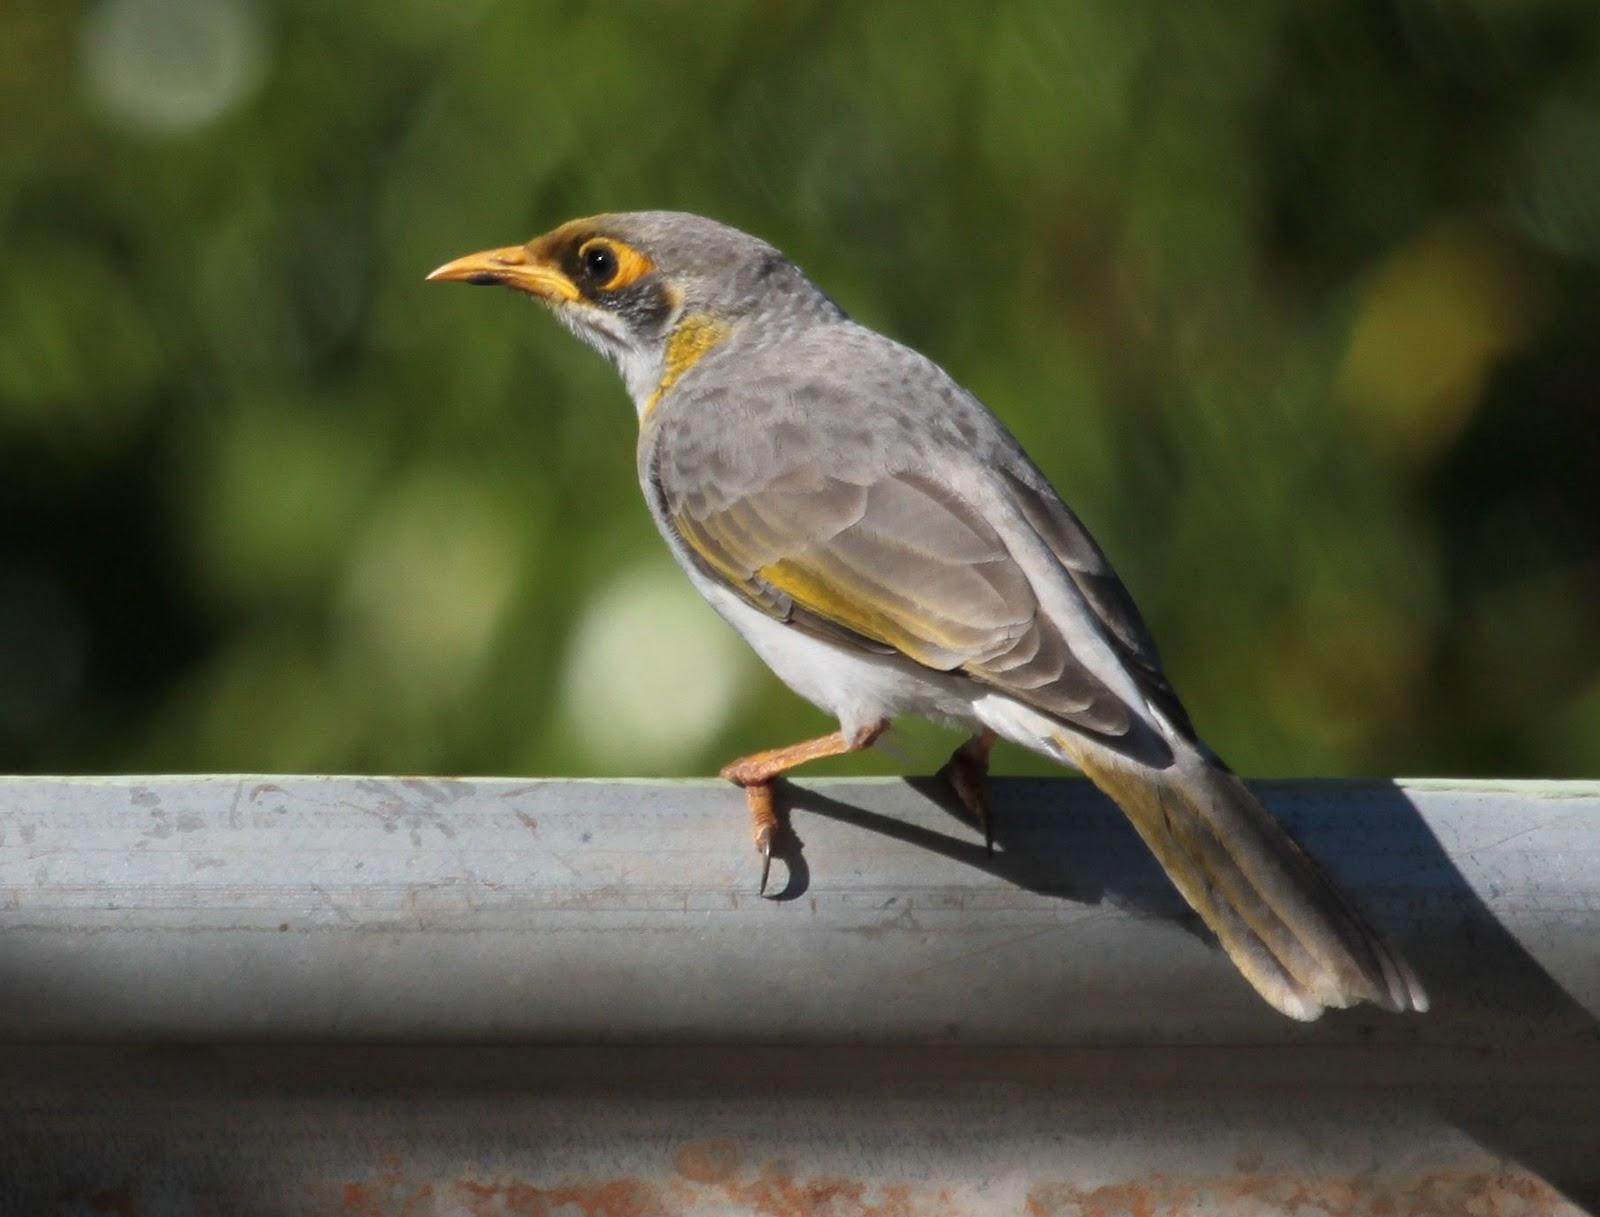 New Gibraltar Encyclopedia of Progressive Rock AR-AZ Australian miner bird photos